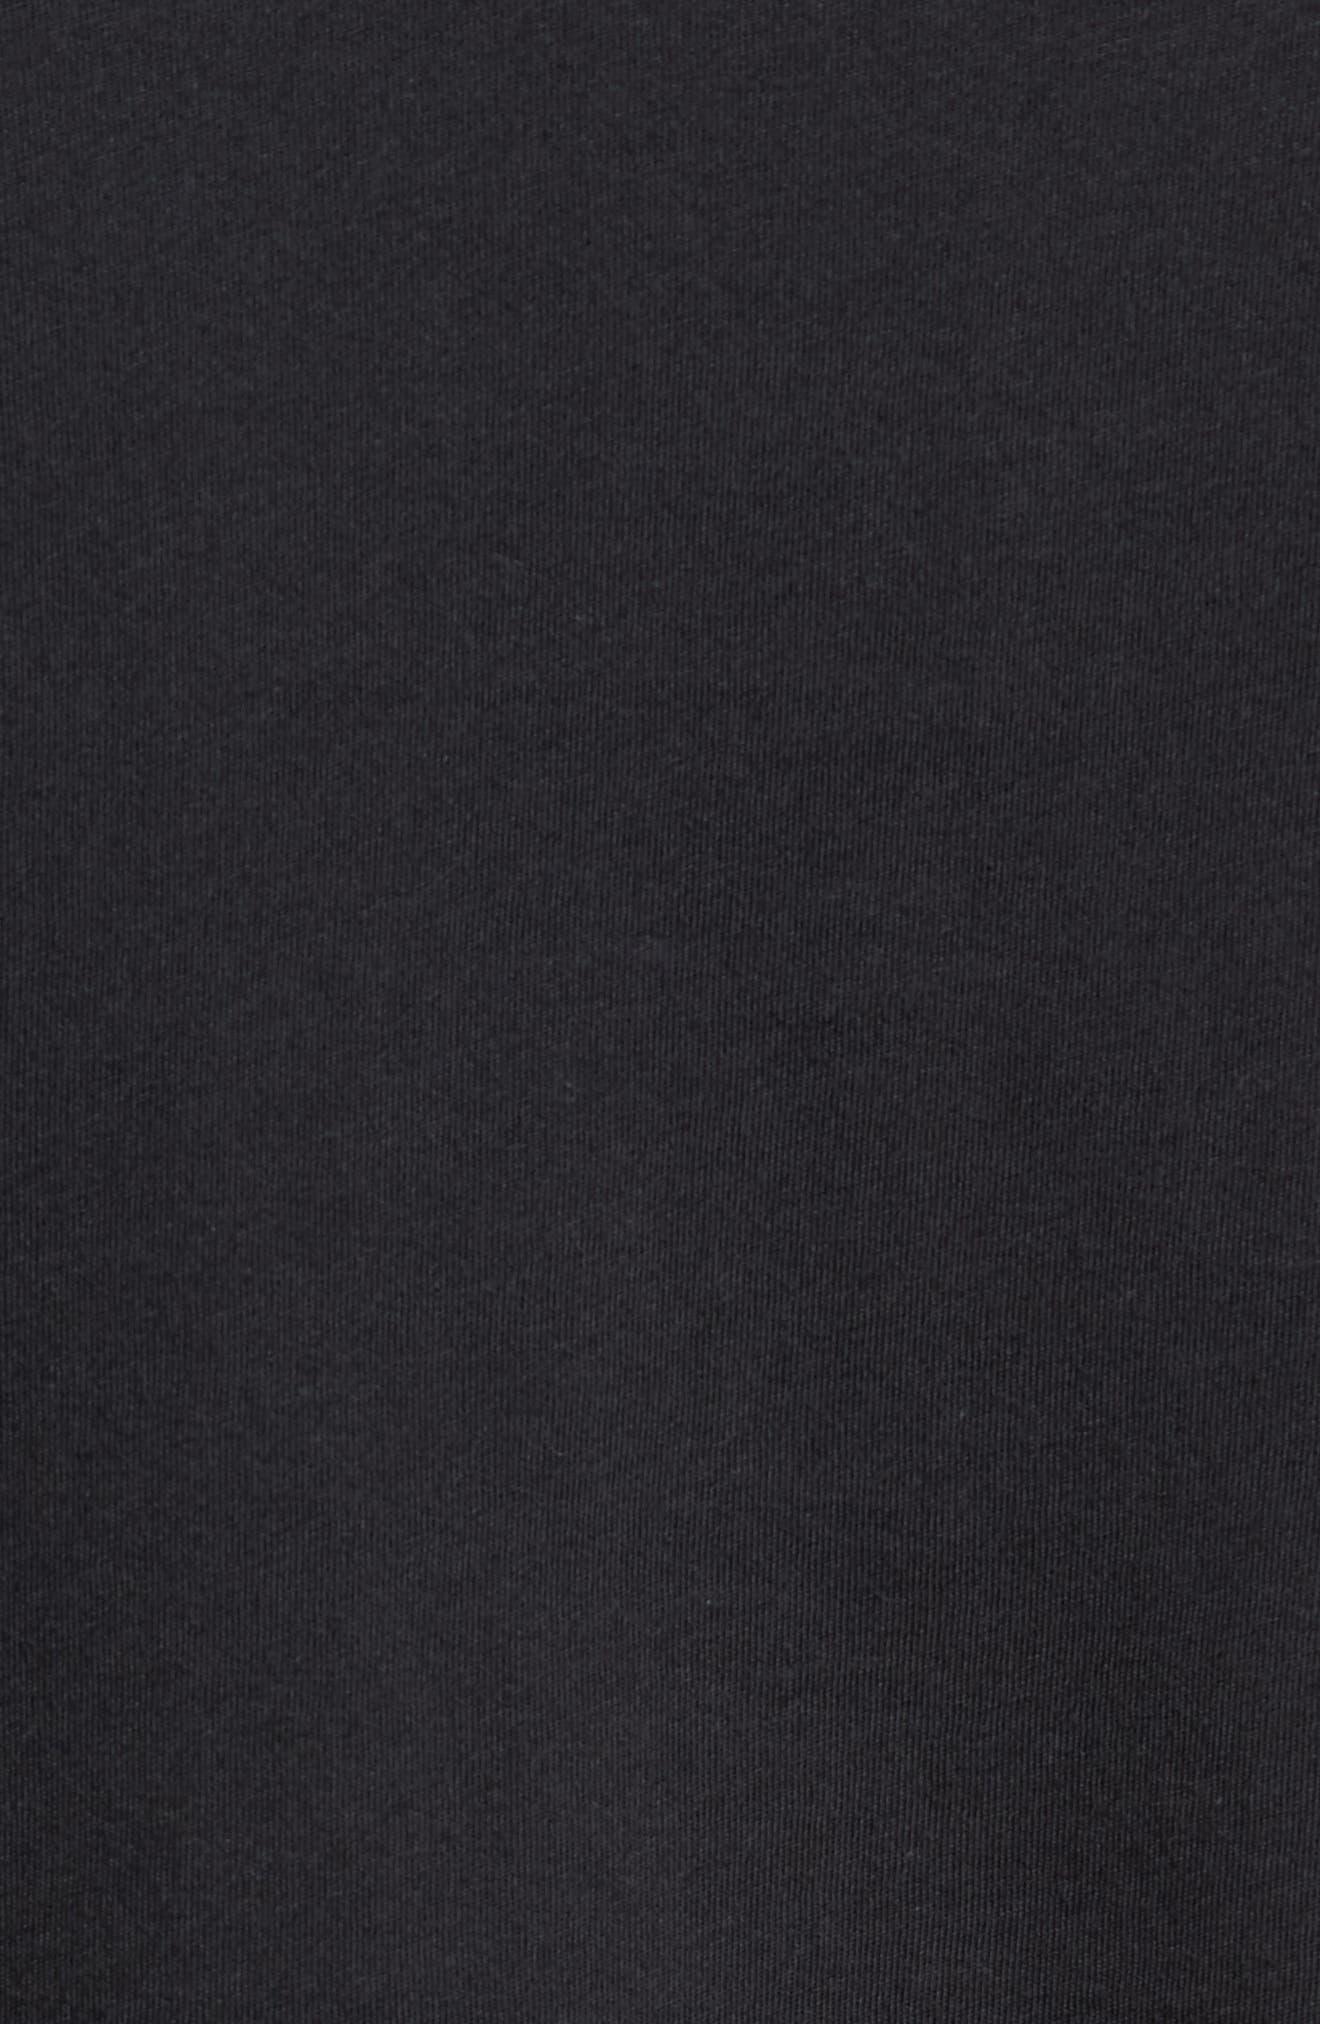 Geologers Organic Cotton T-Shirt,                             Alternate thumbnail 5, color,                             BLACK